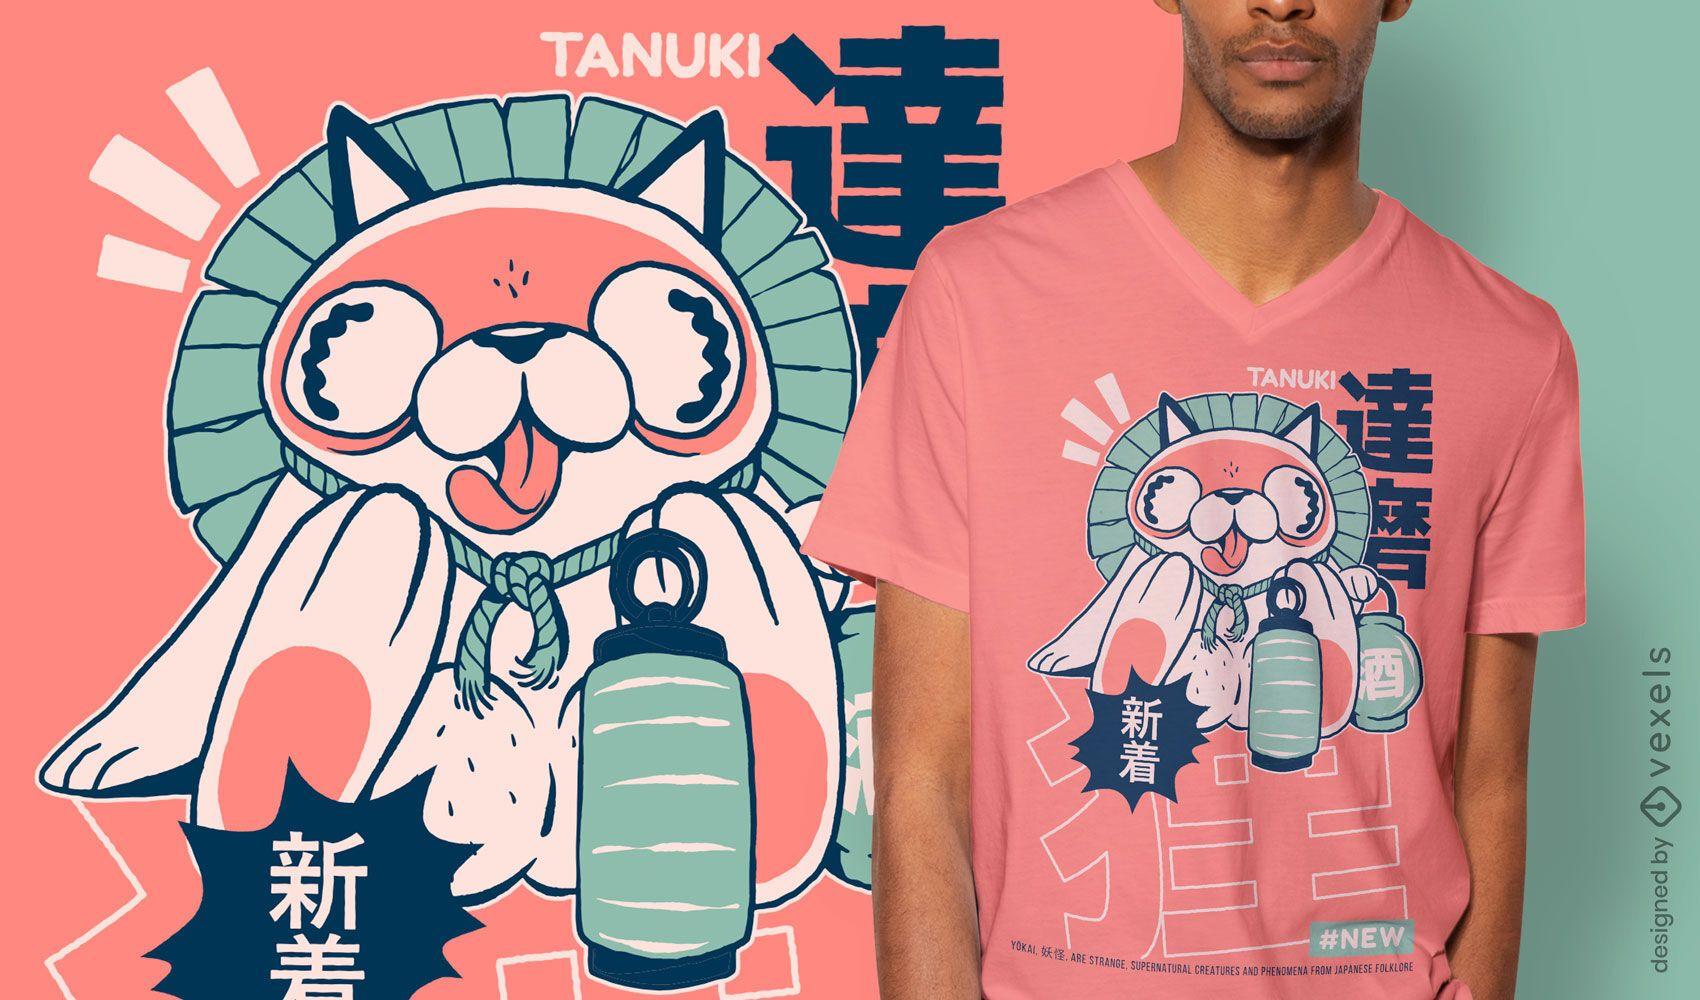 Tanuki japanisches Yokai T-Shirt Design